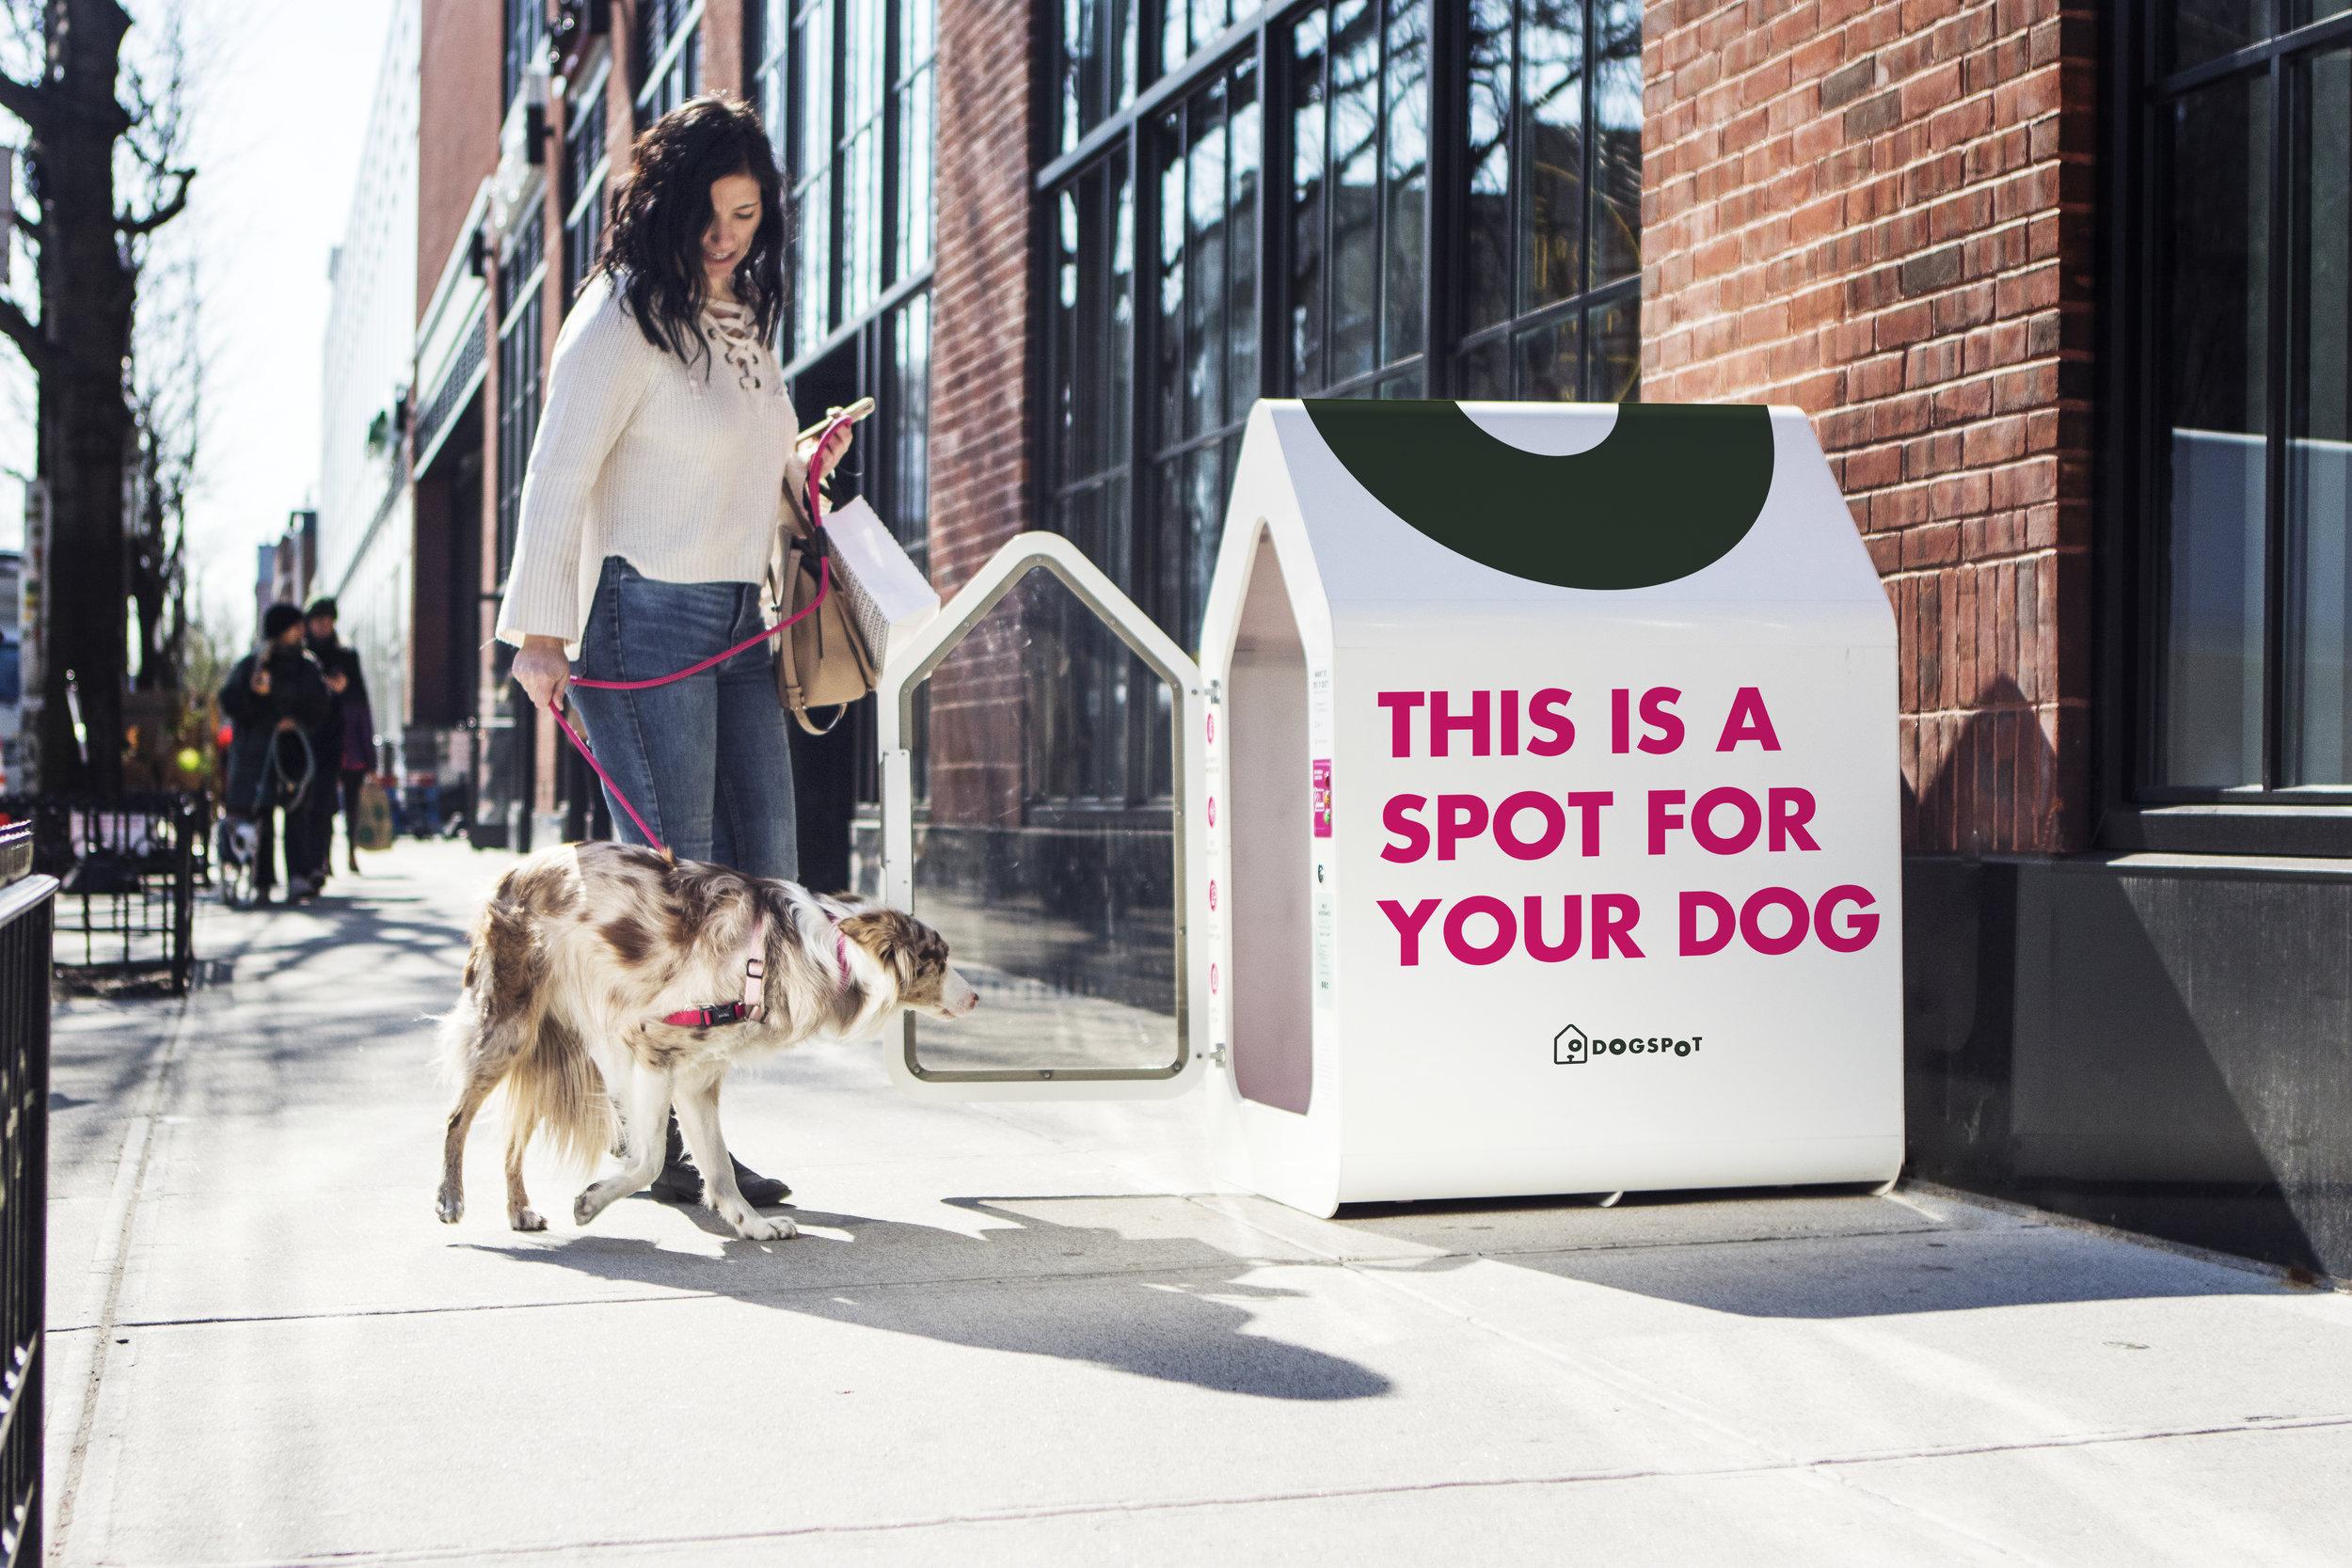 Introducing a revolutionary smart city amenity - Make your entire property a dog-friendly destination.